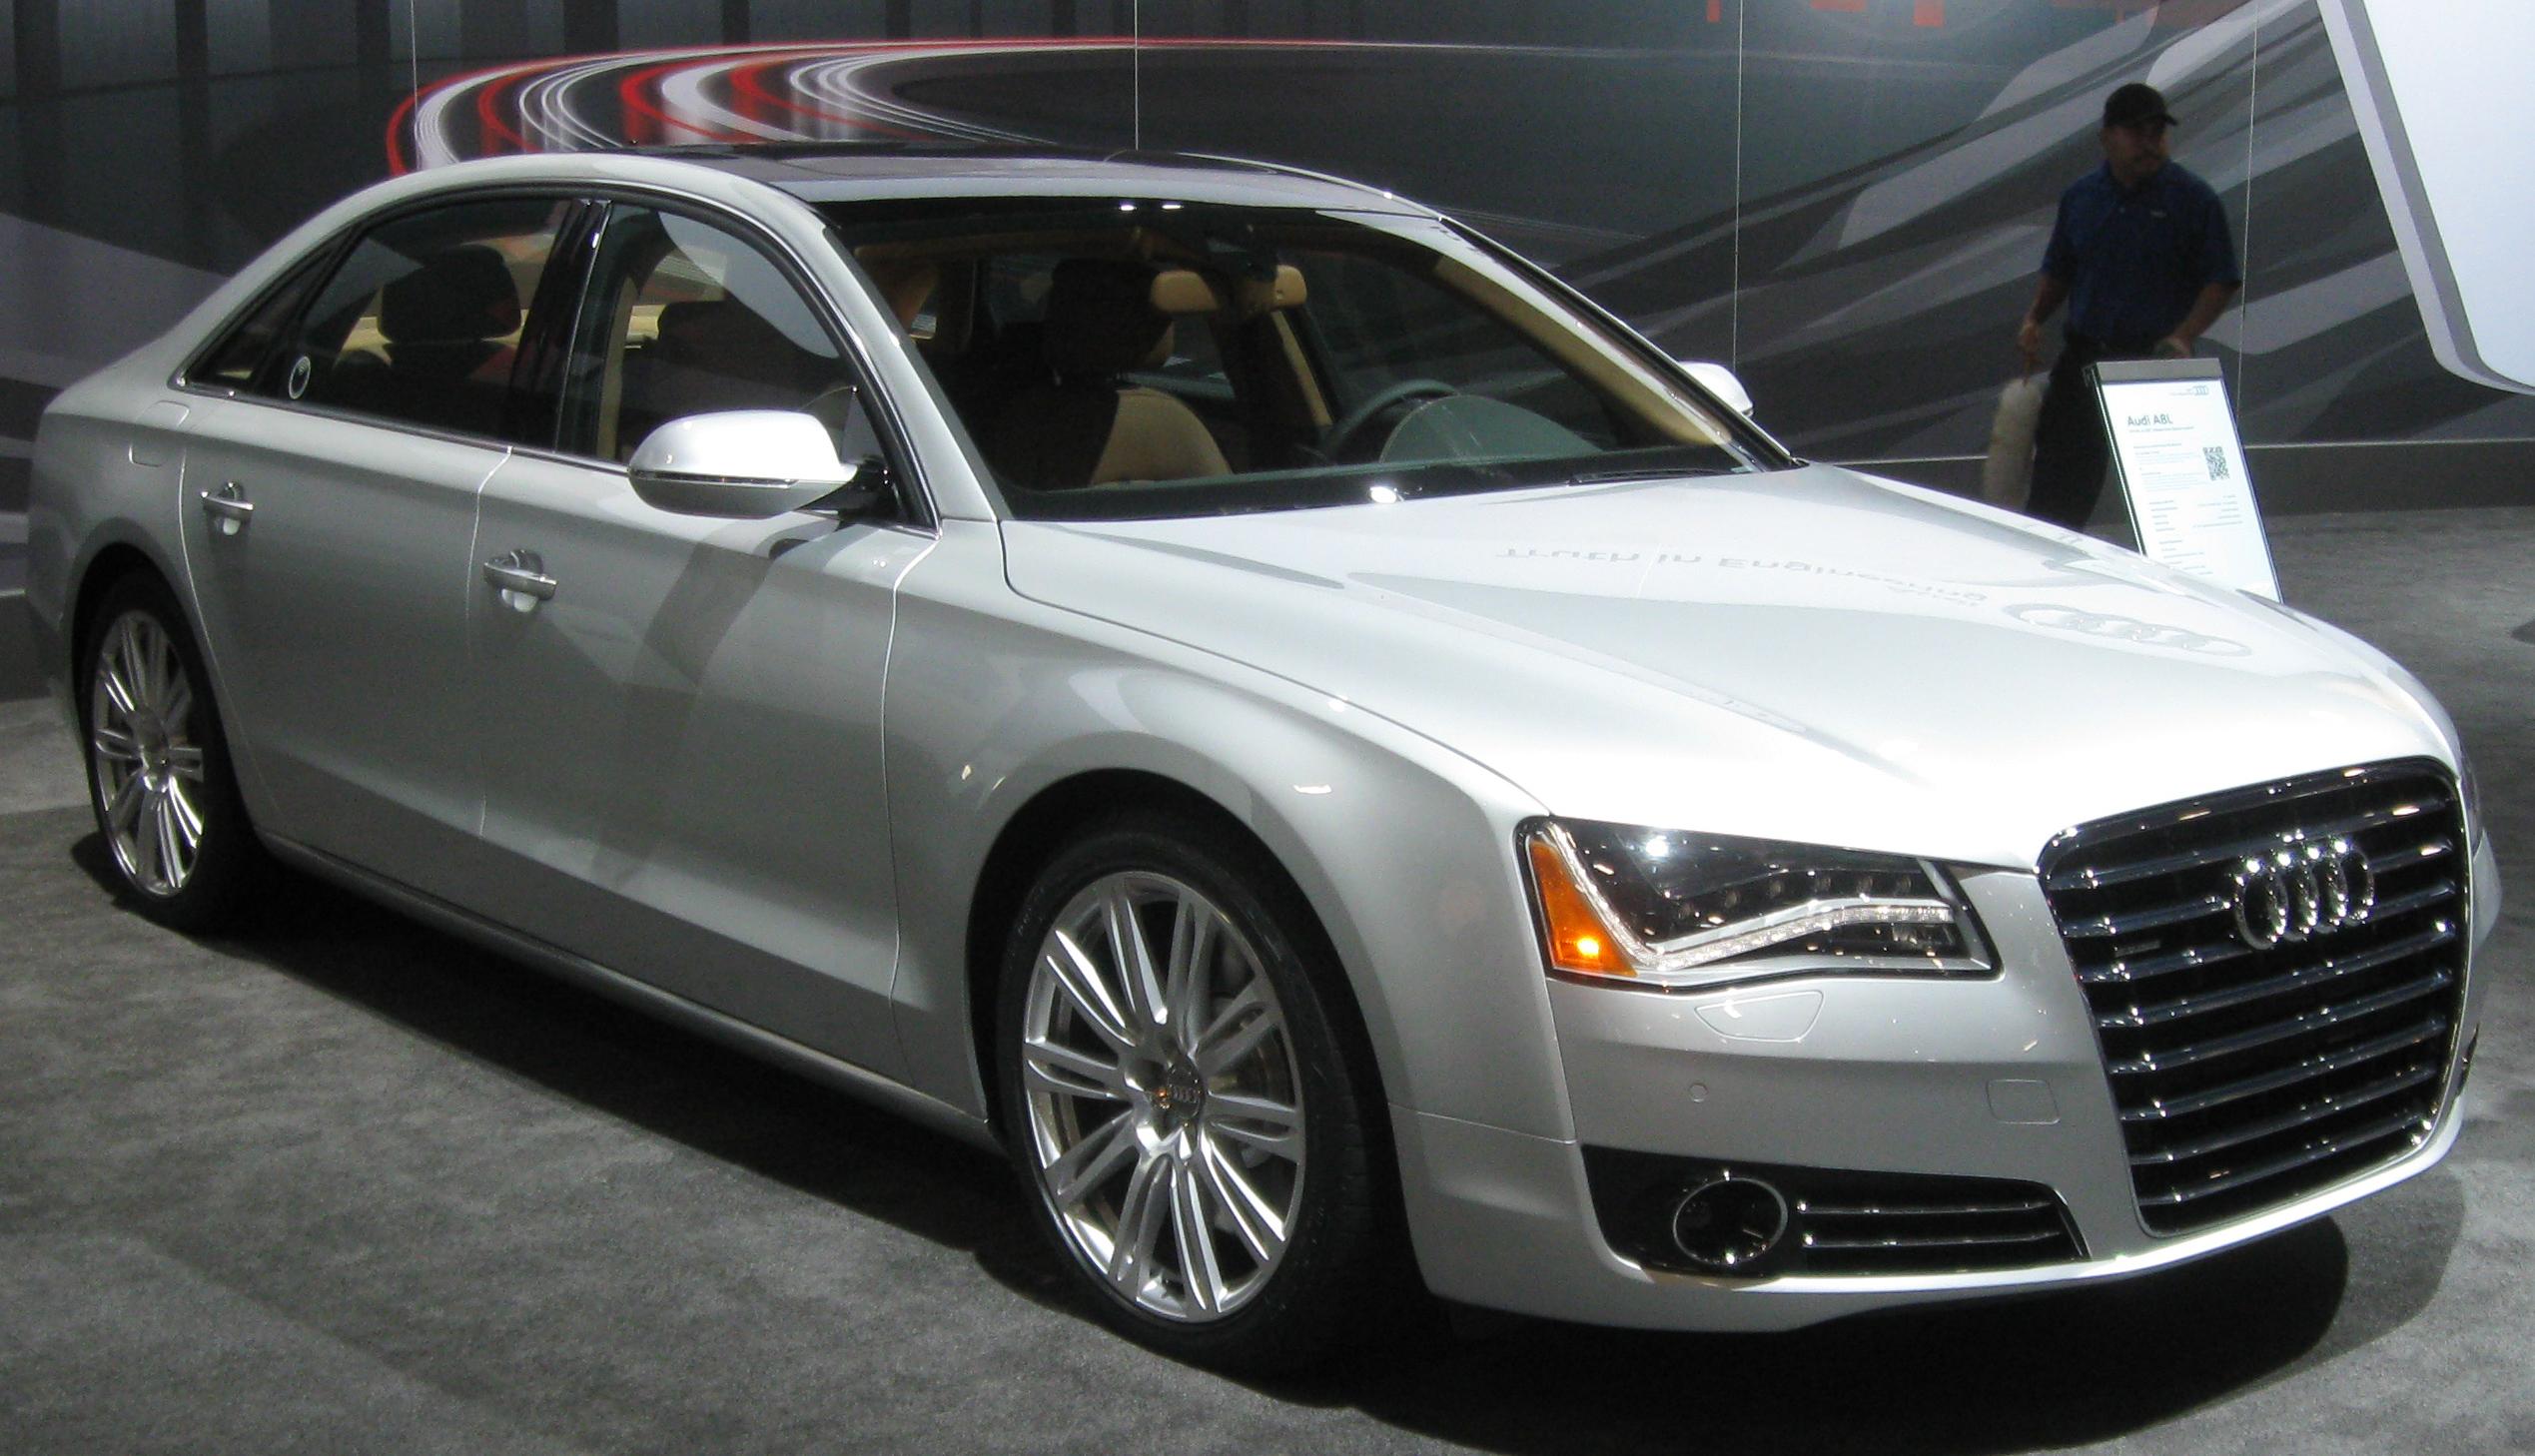 2011 Audi A8 Image 10